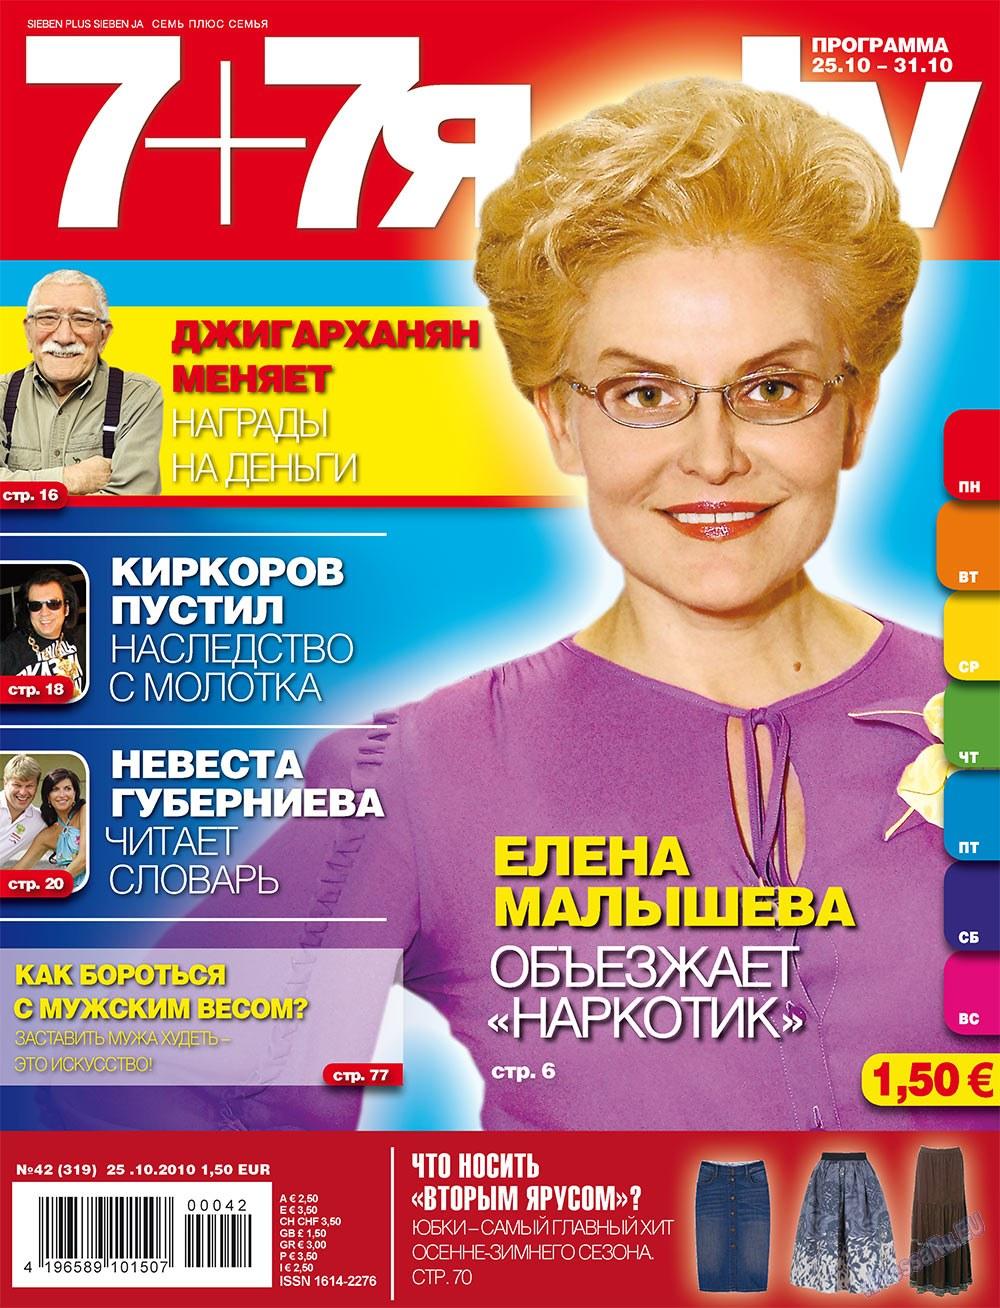 7плюс7я (журнал). 2010 год, номер 42, стр. 1